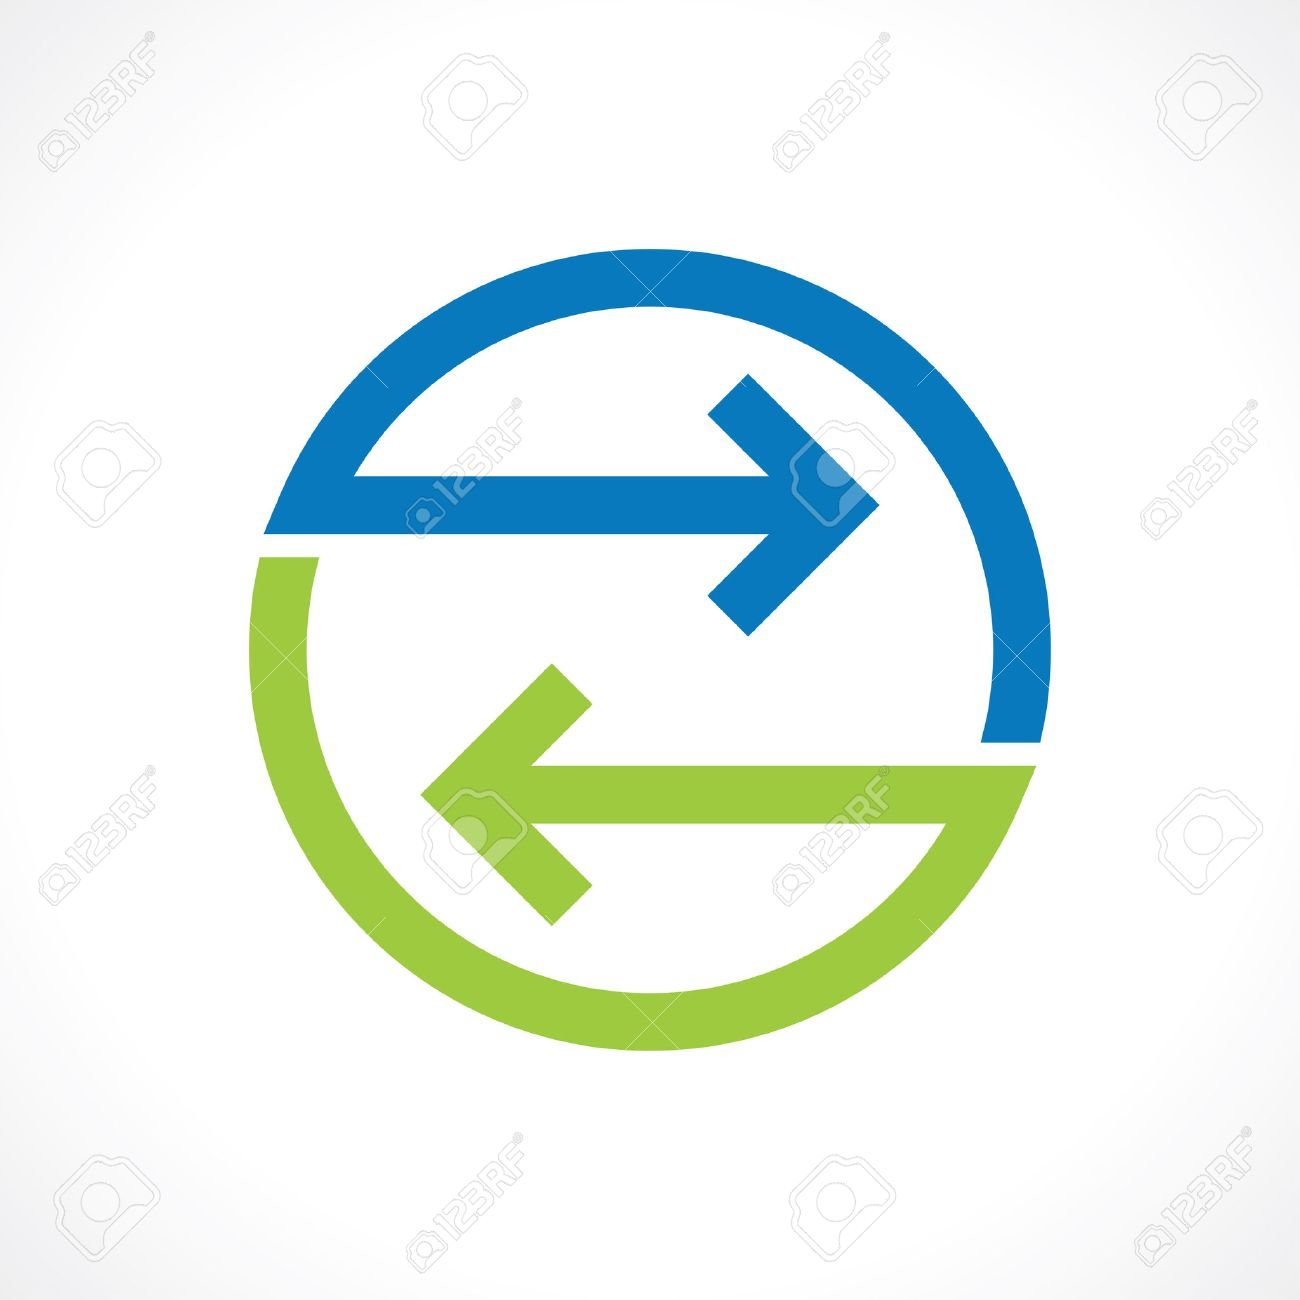 symbol of bidirectional arrows - 46672799